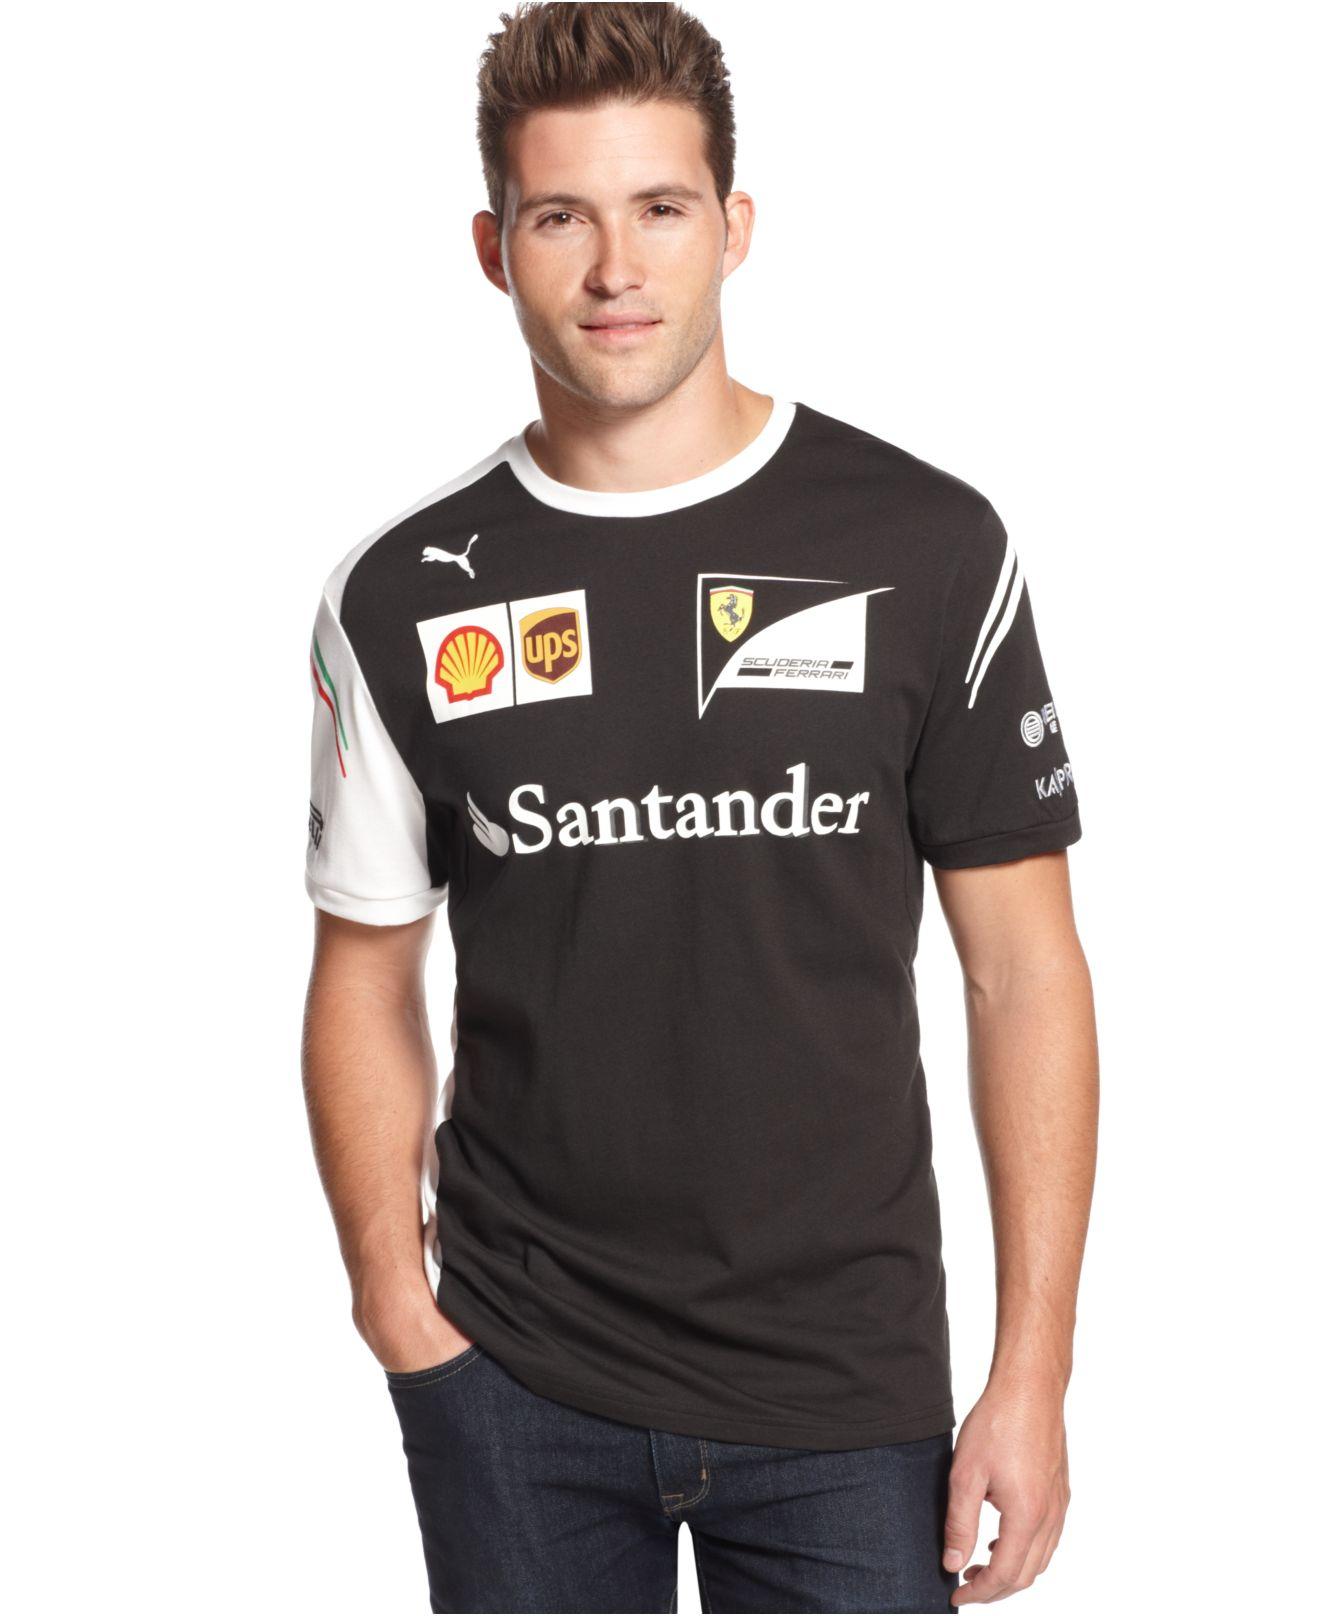 p ferrari logo smart shirt wear bridgestone t red team racing